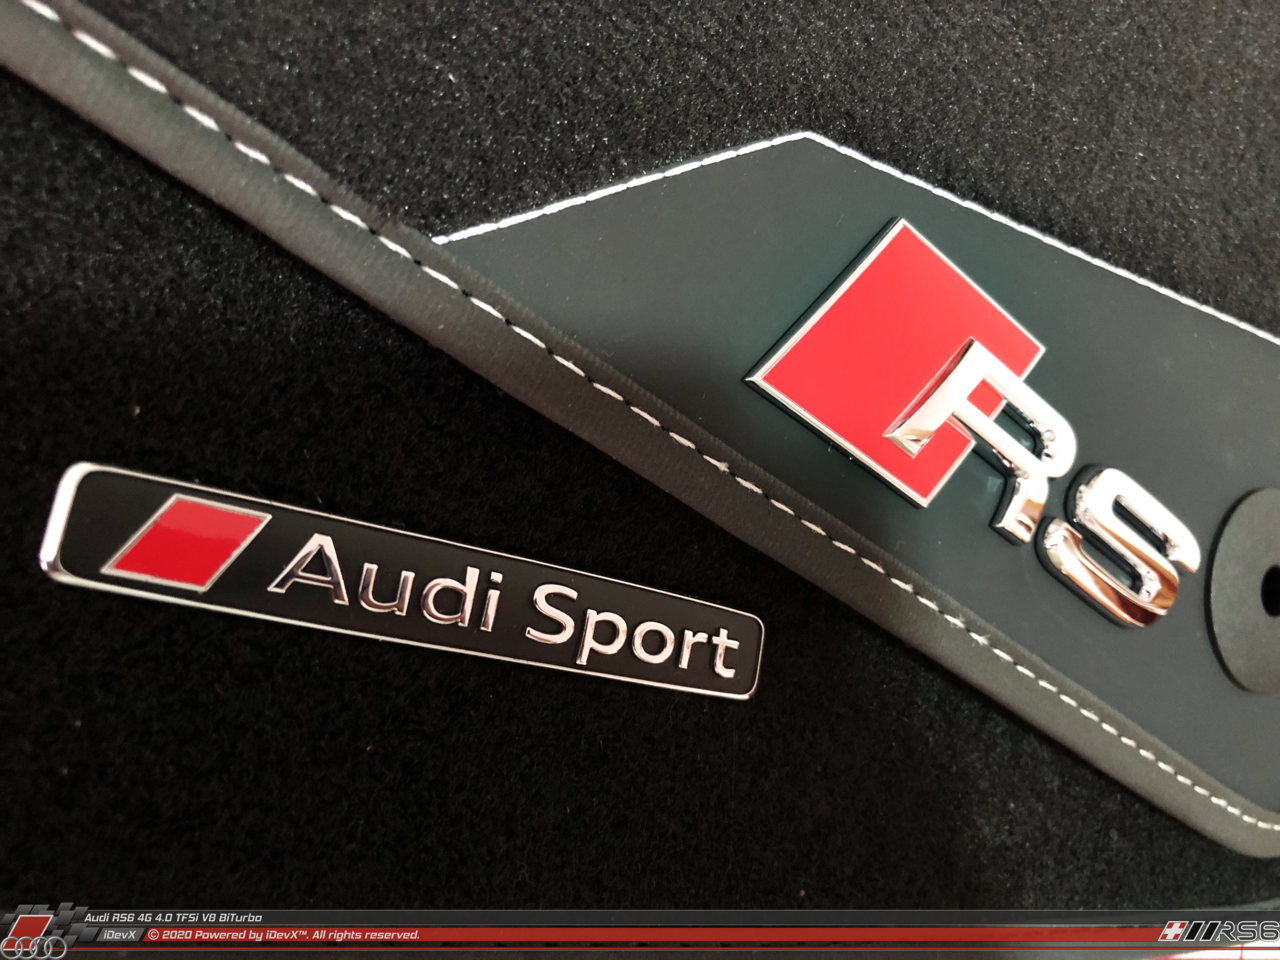 15_08.2019_Audi-RS6_iDevX_014.png